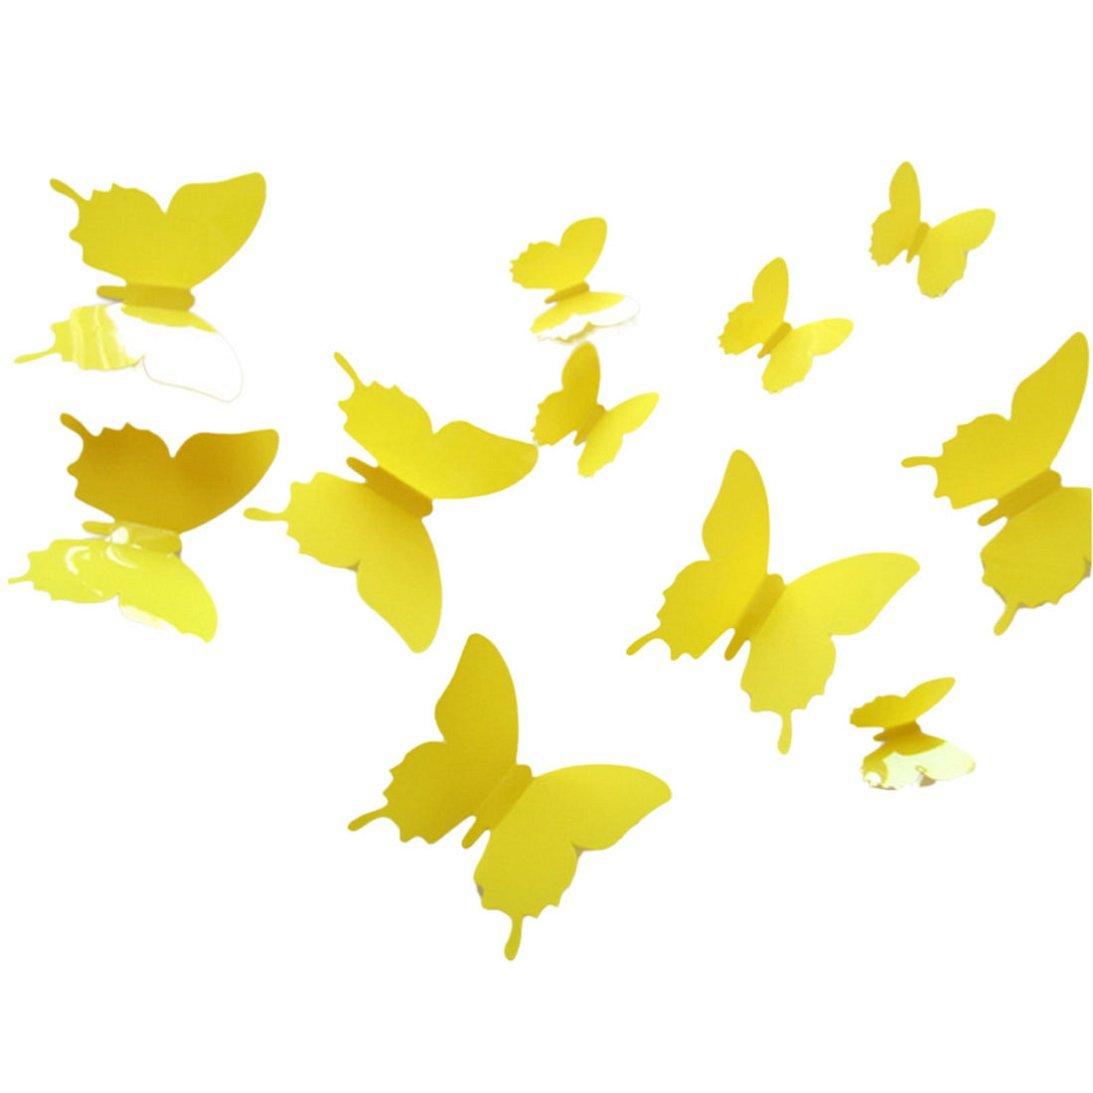 Amazon.com: Sunward 12pcs 3D Butterfly Wall Stickers Butterflies ...